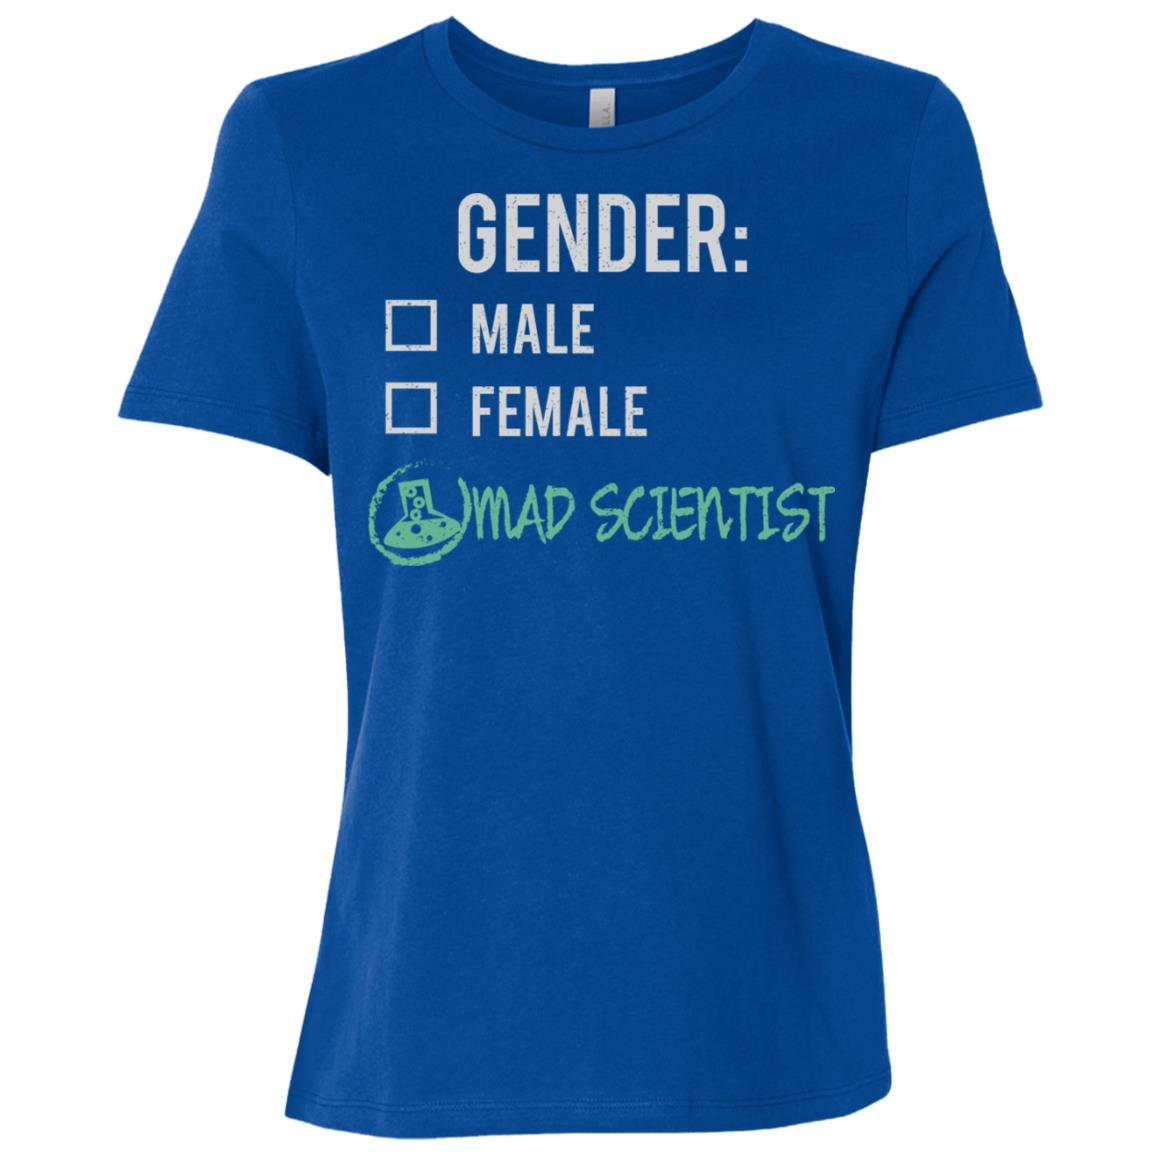 Male Female Mad Scientist Gender Nonbinary Trans Women Short Sleeve T-Shirt